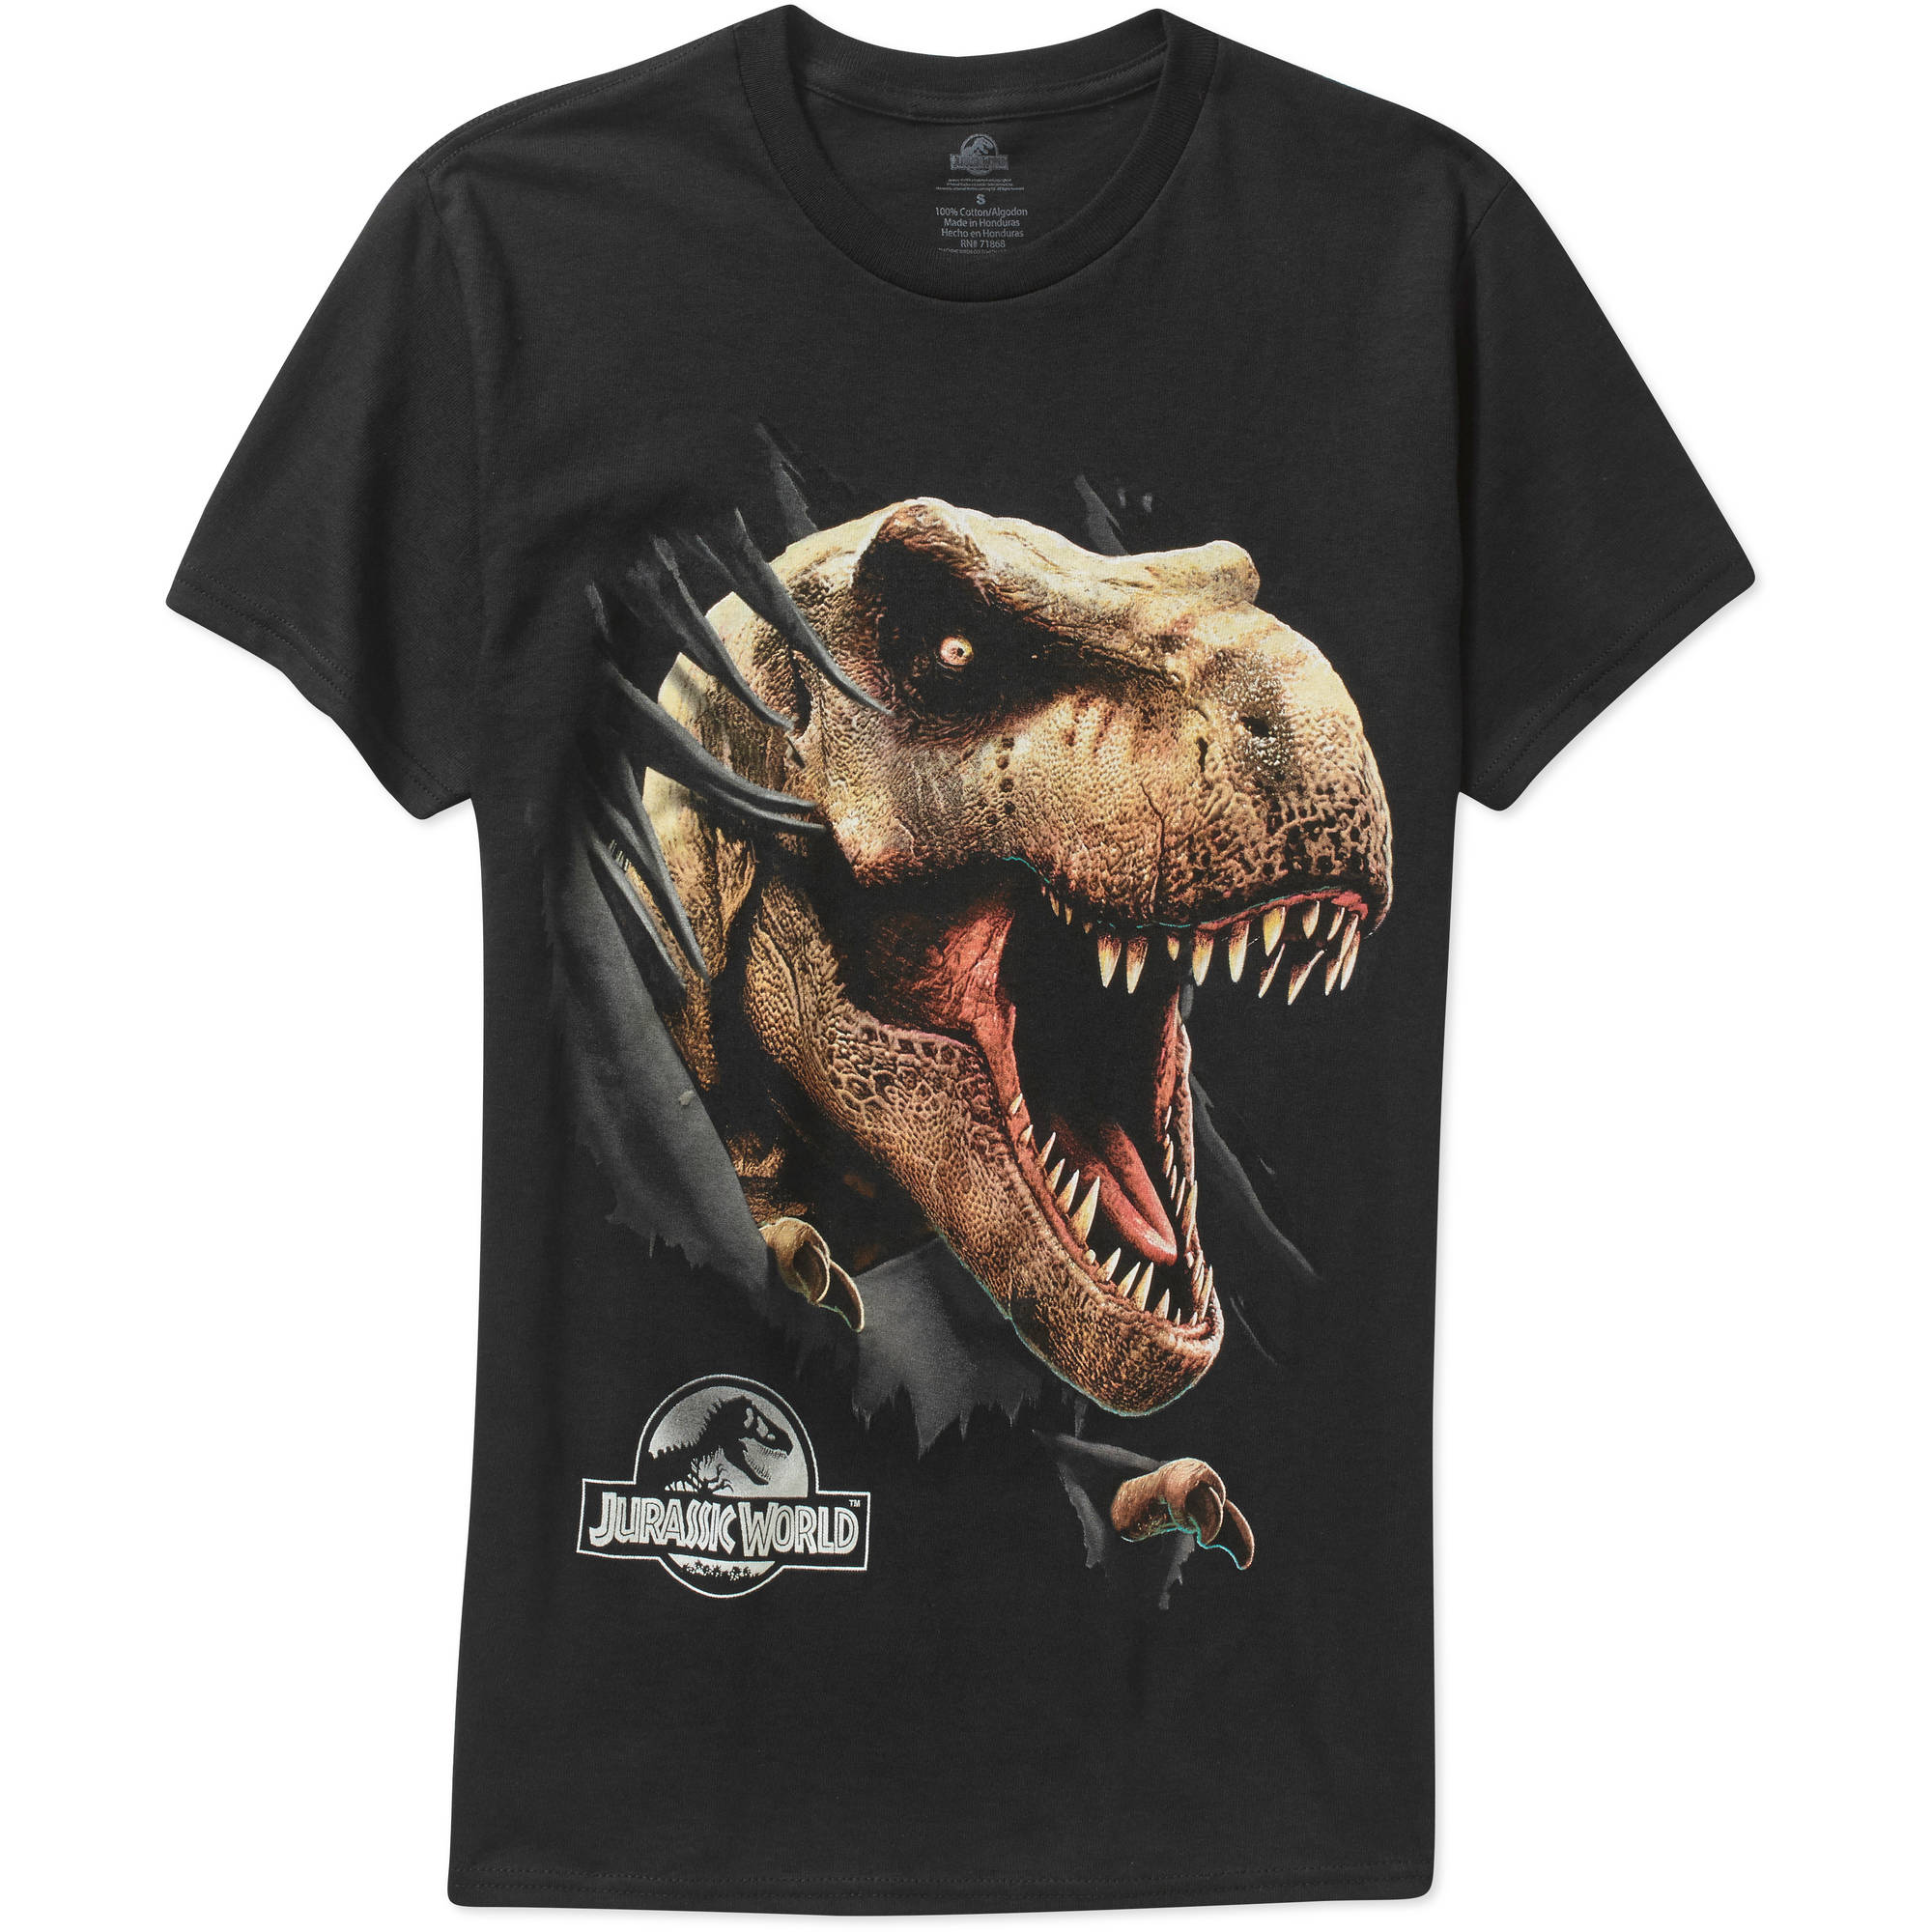 NBC Universal Jurassic World Dinosaur Big Men's Graphic Short Sleeve T-Shirt